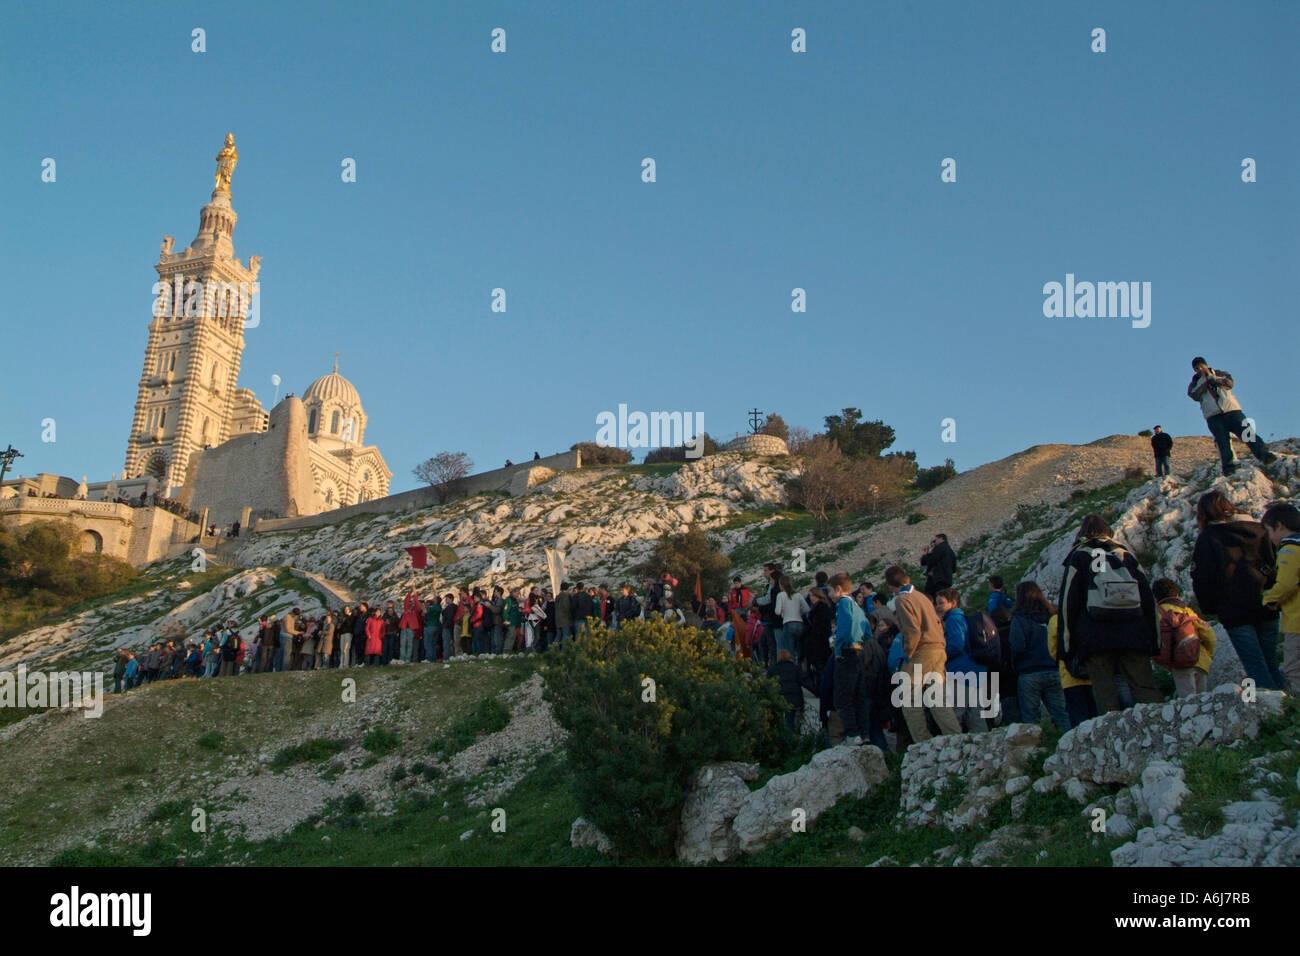 Schoolchildren climbing up to Notre Dame De La Garde Basilica in Marseille, France - Stock Image